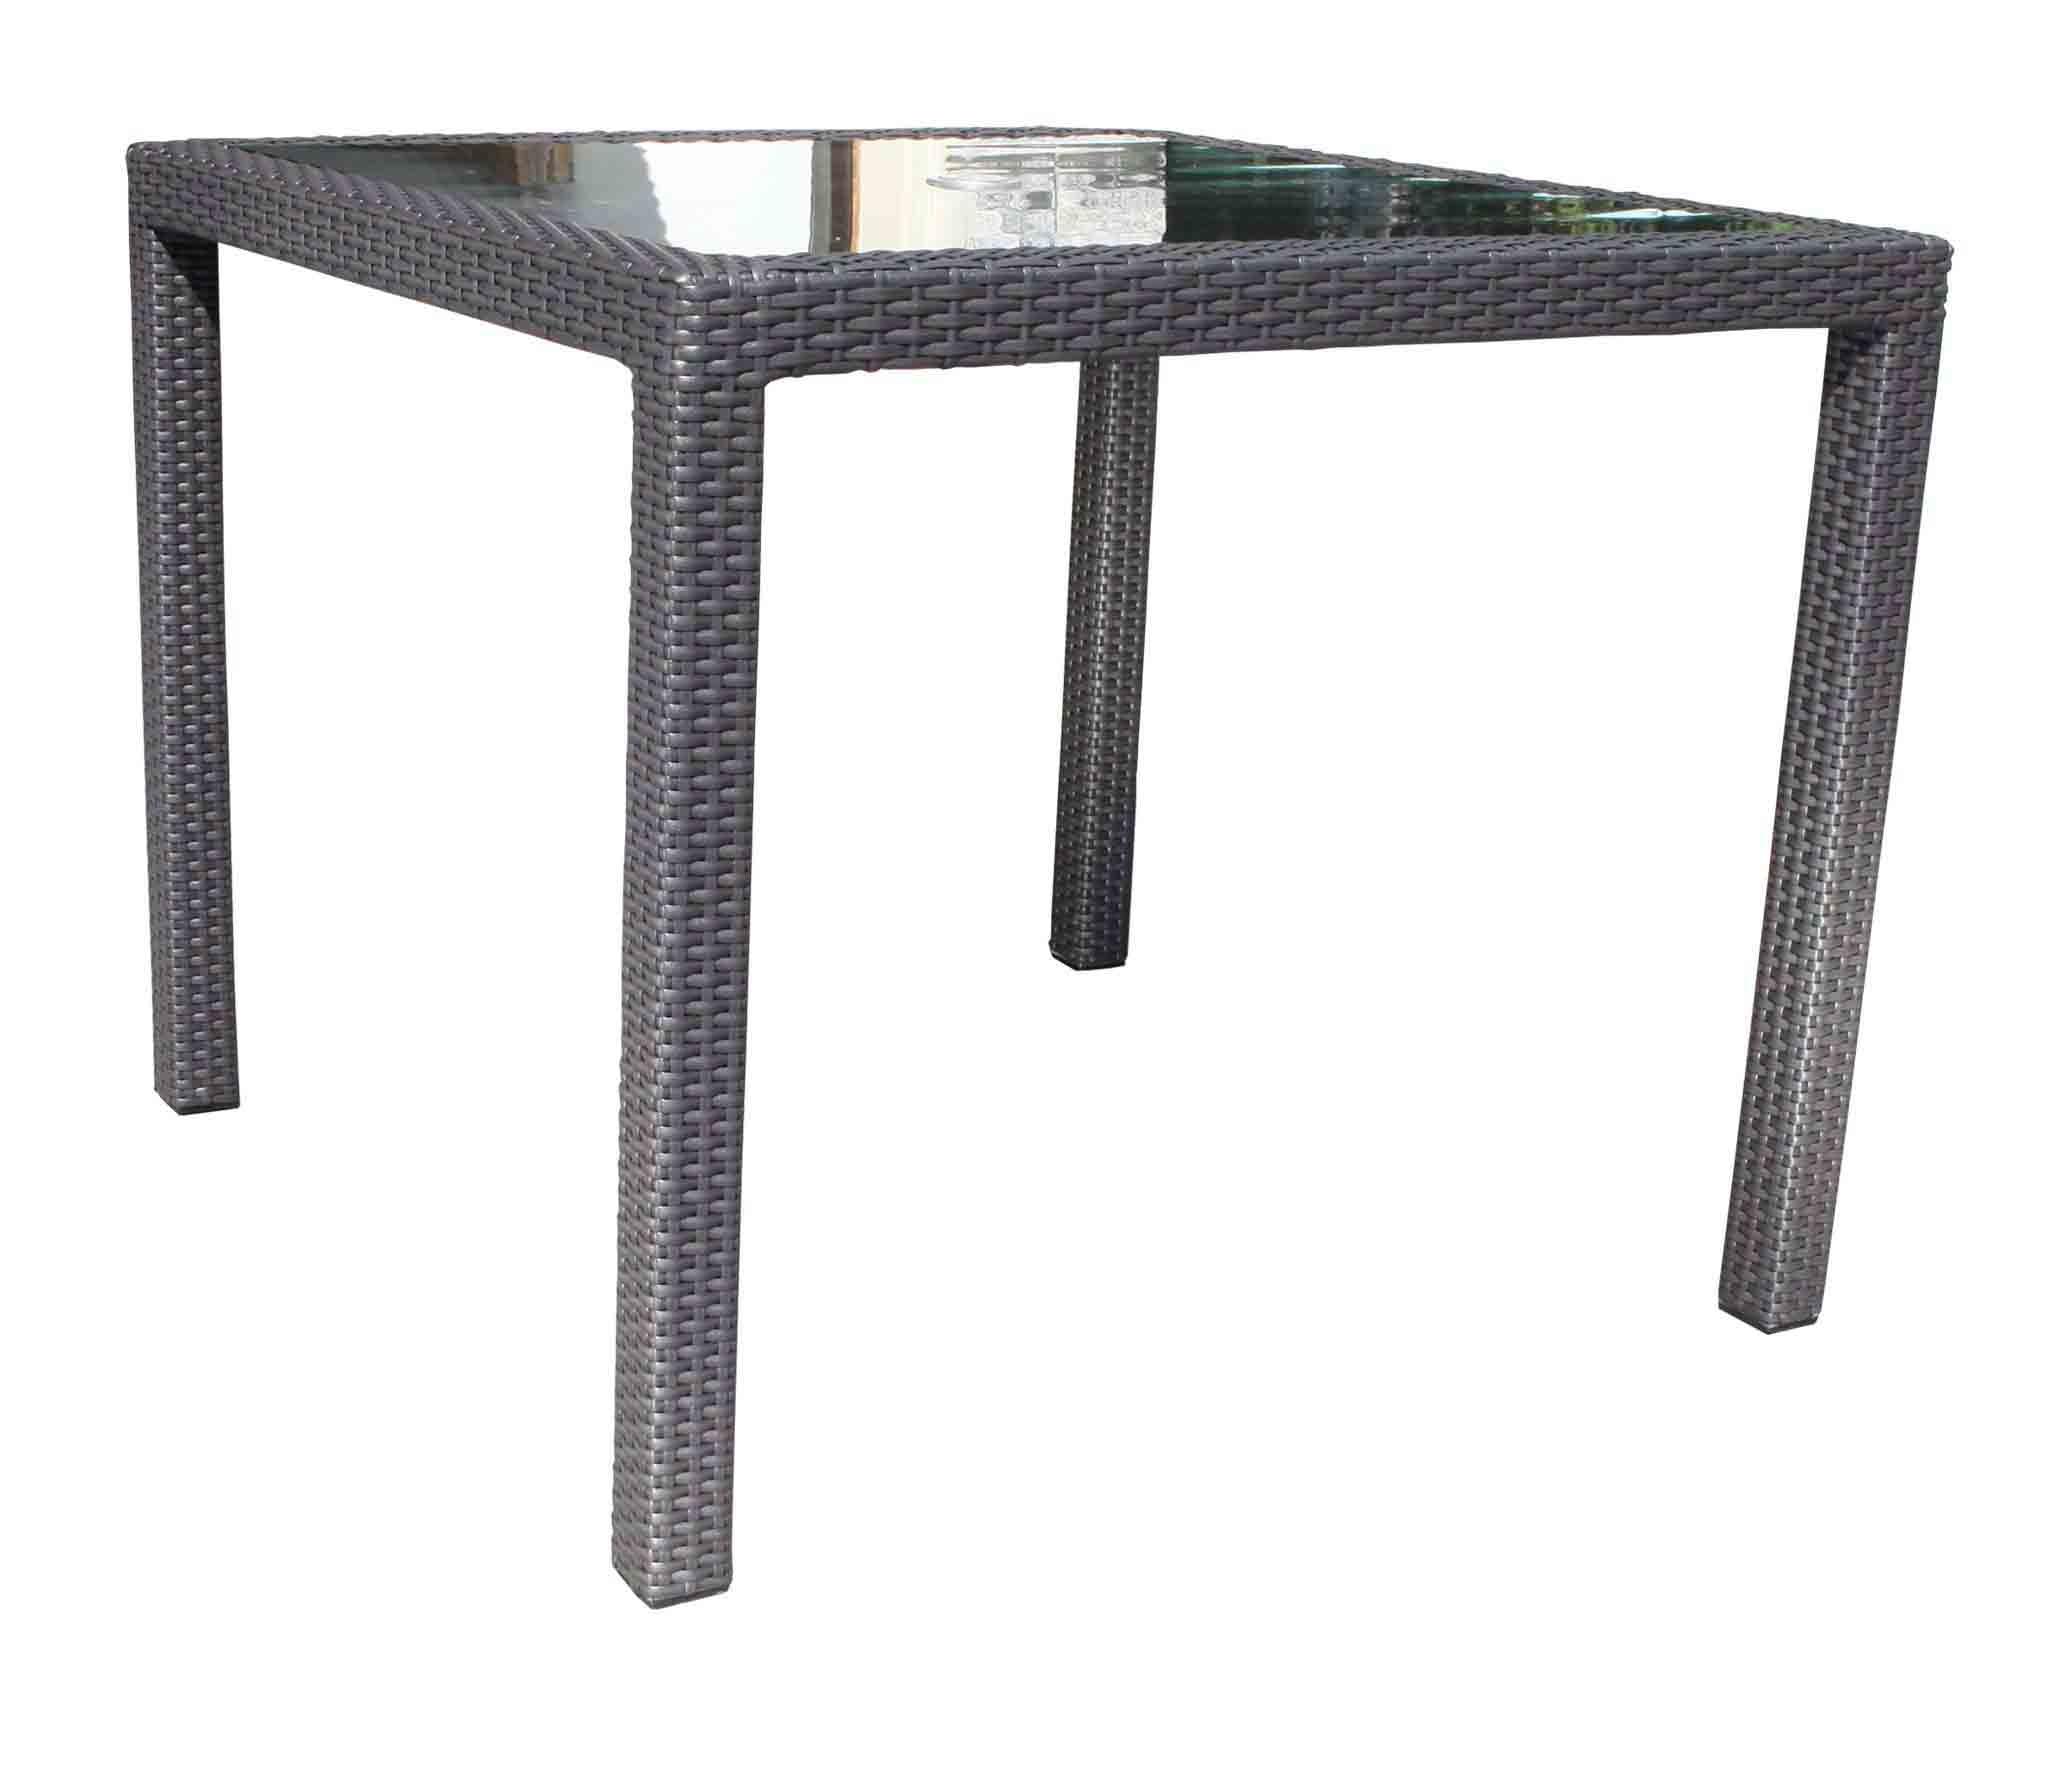 CabanaCoast Furniture Chorus 36 Square Table 8504 3636